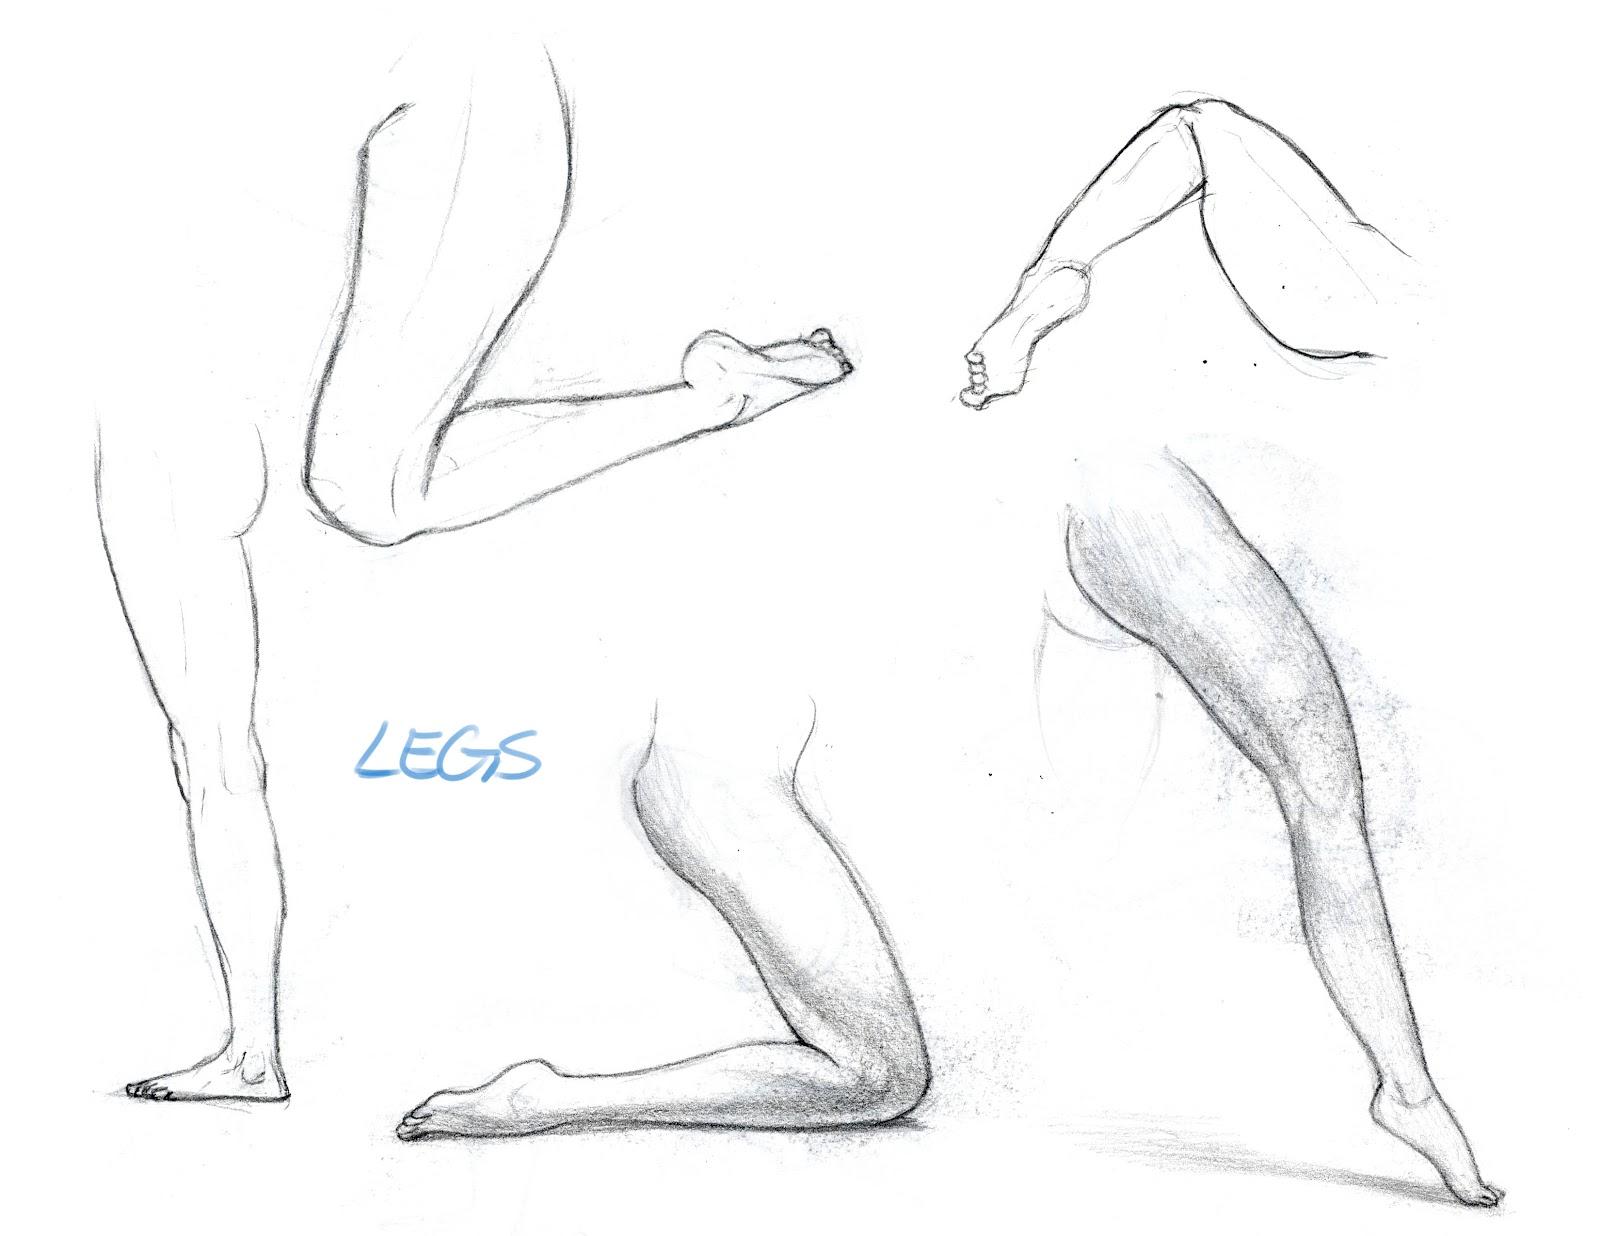 1600x1236 Arash Rod's Art Arms And Legs Drawings